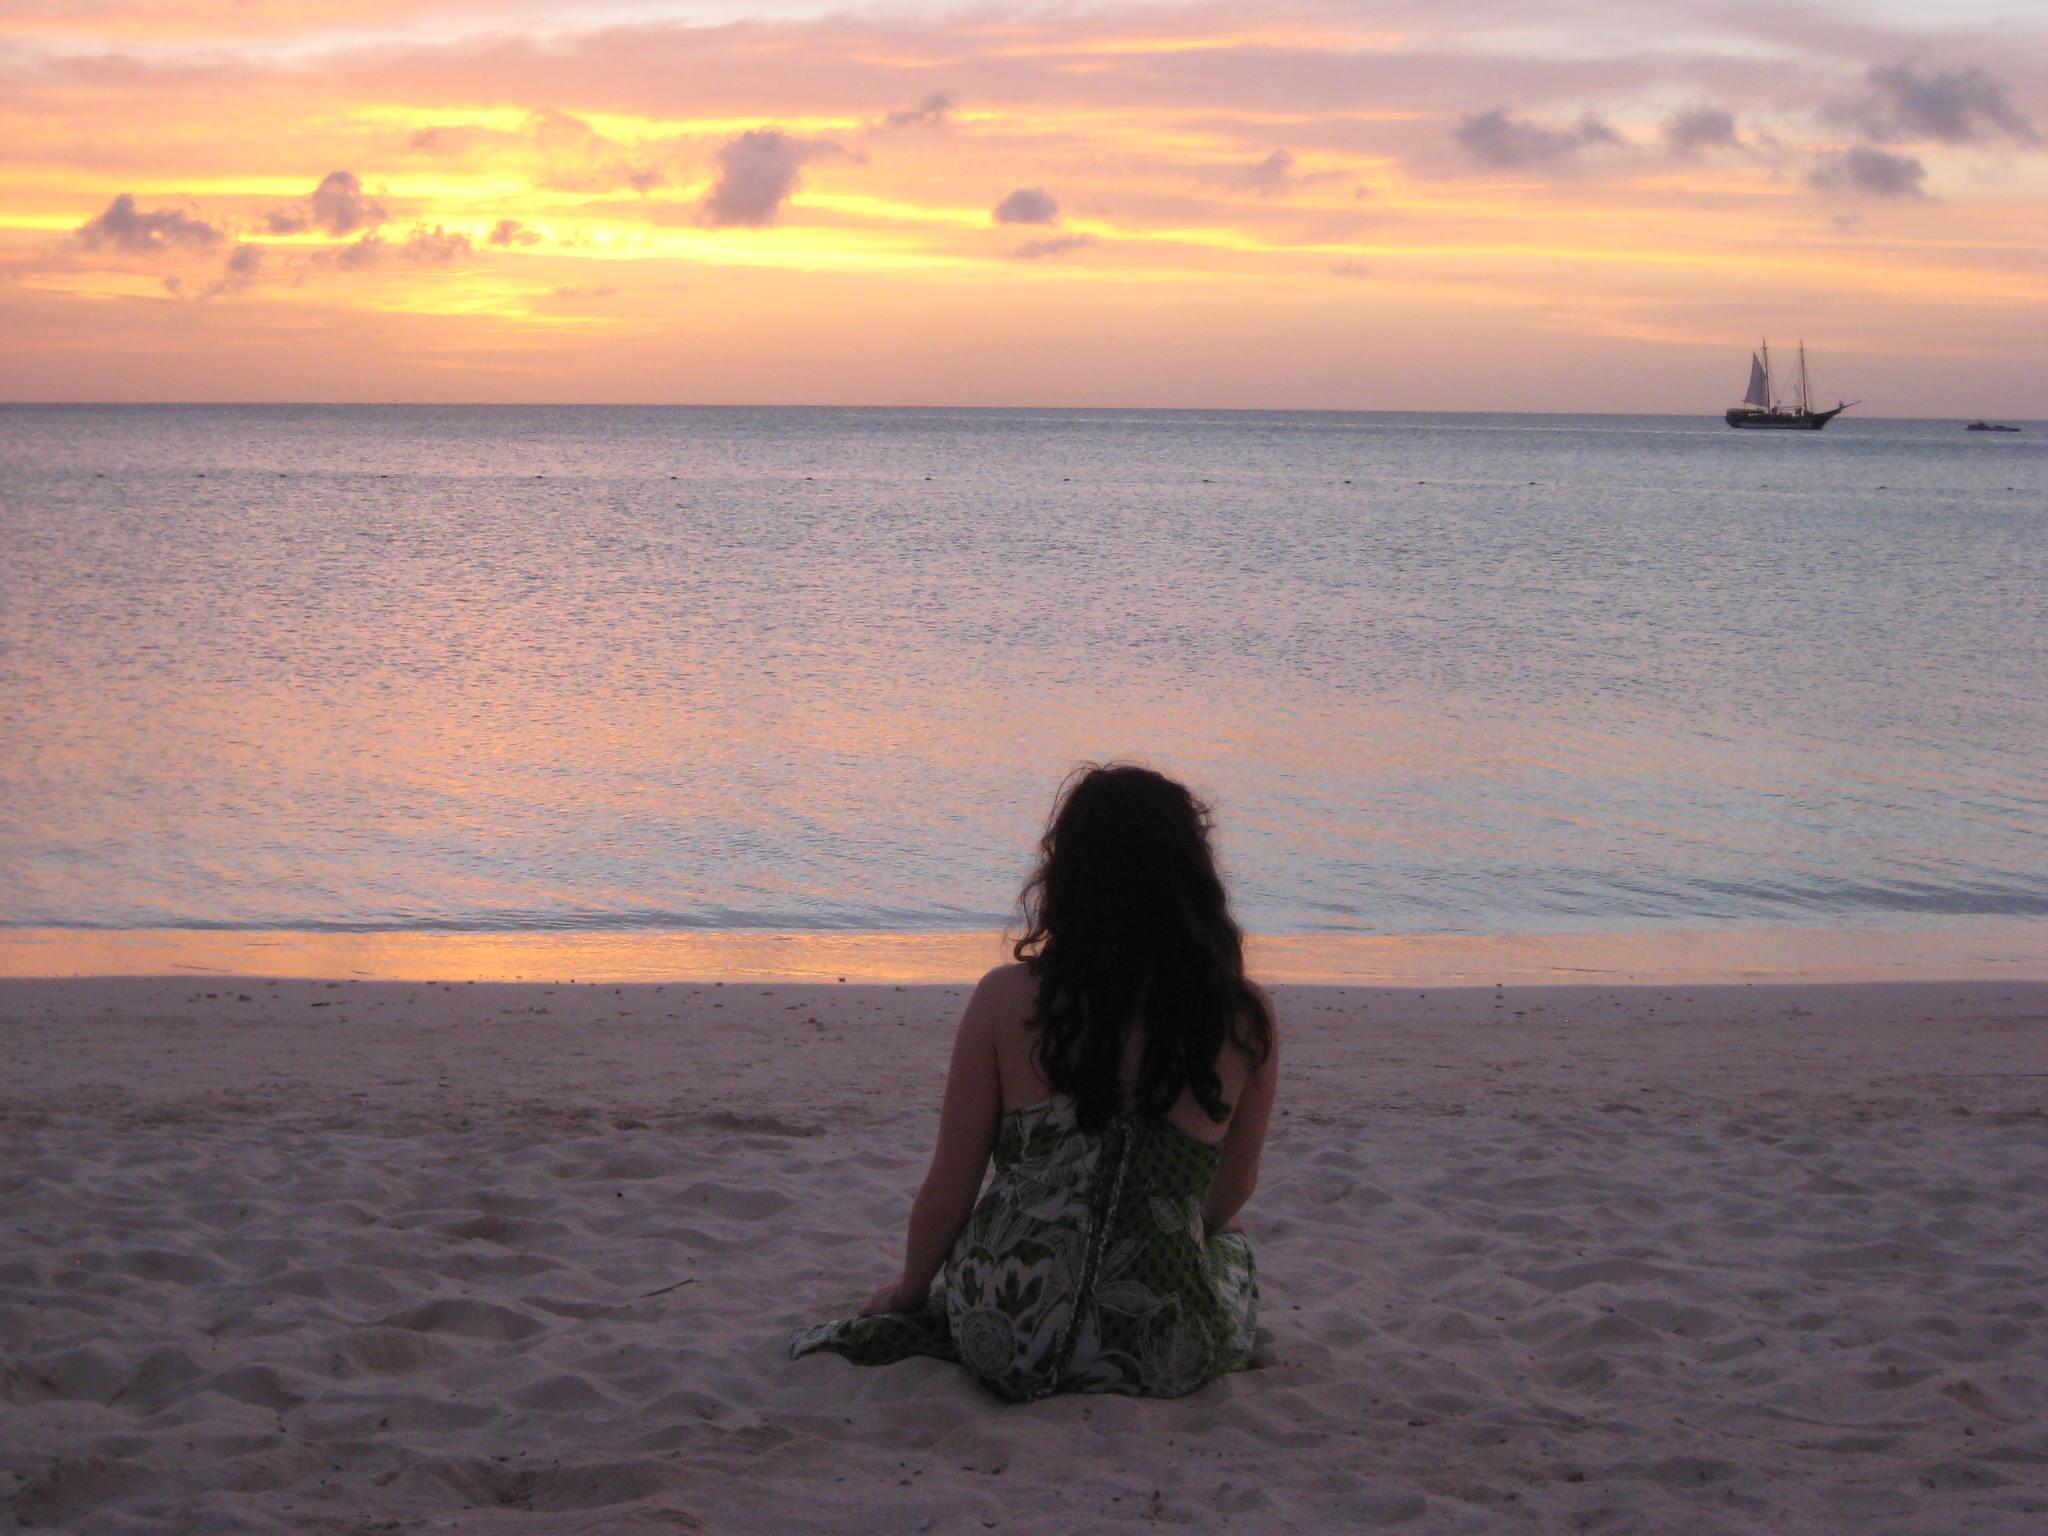 Pondering life in Aruba.